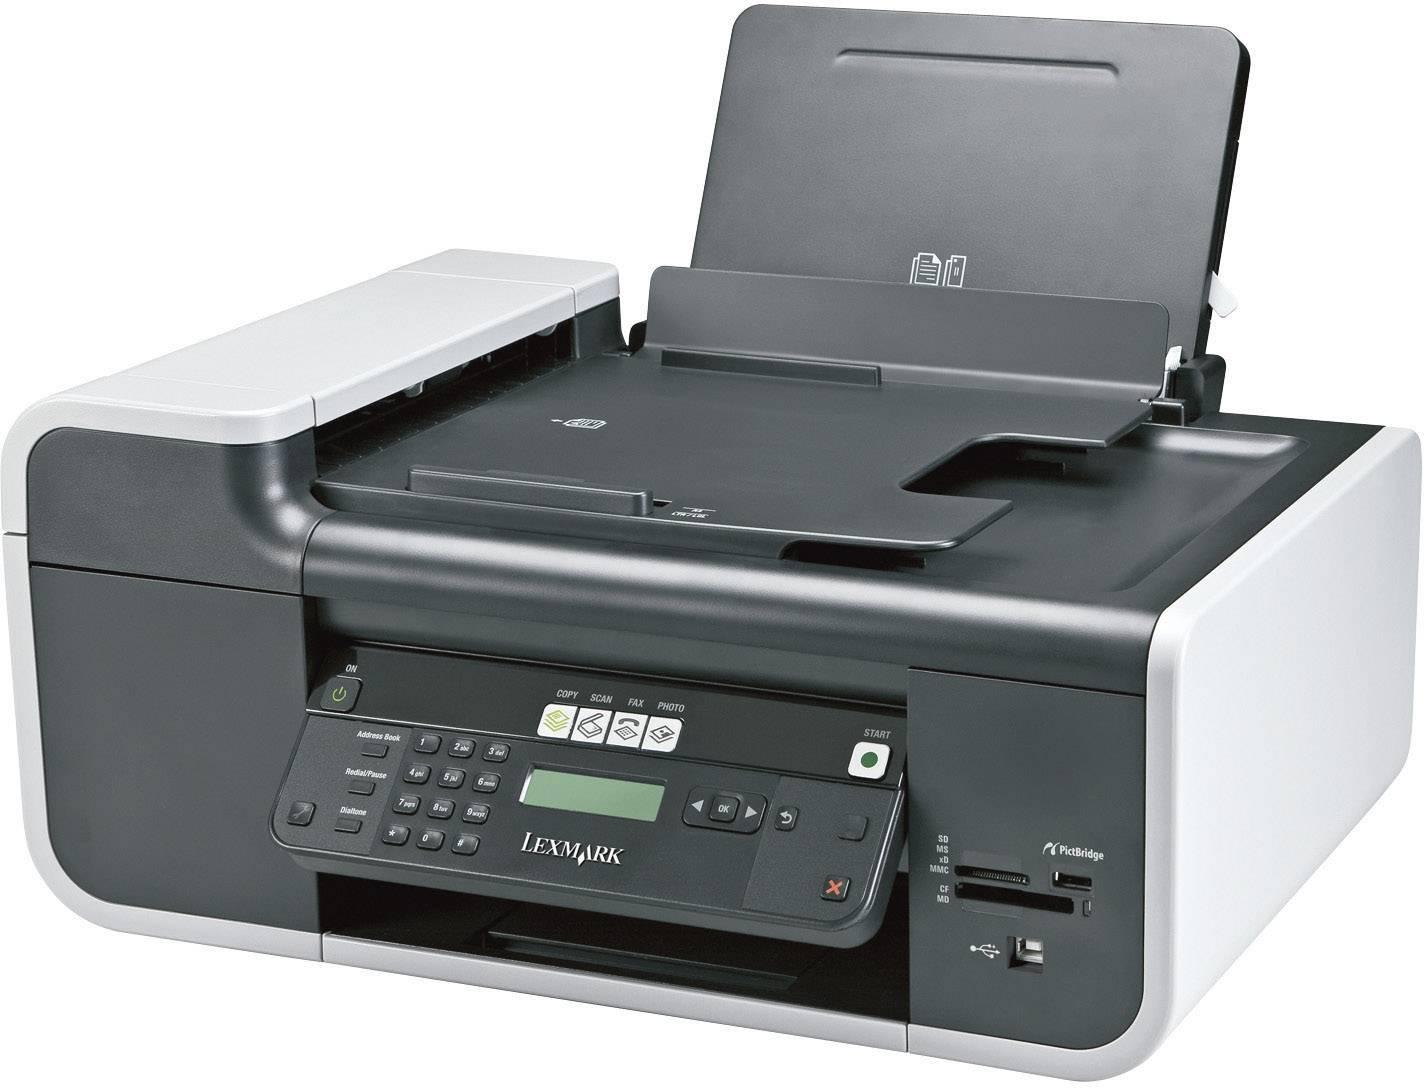 logiciel imprimante lexmark x5650